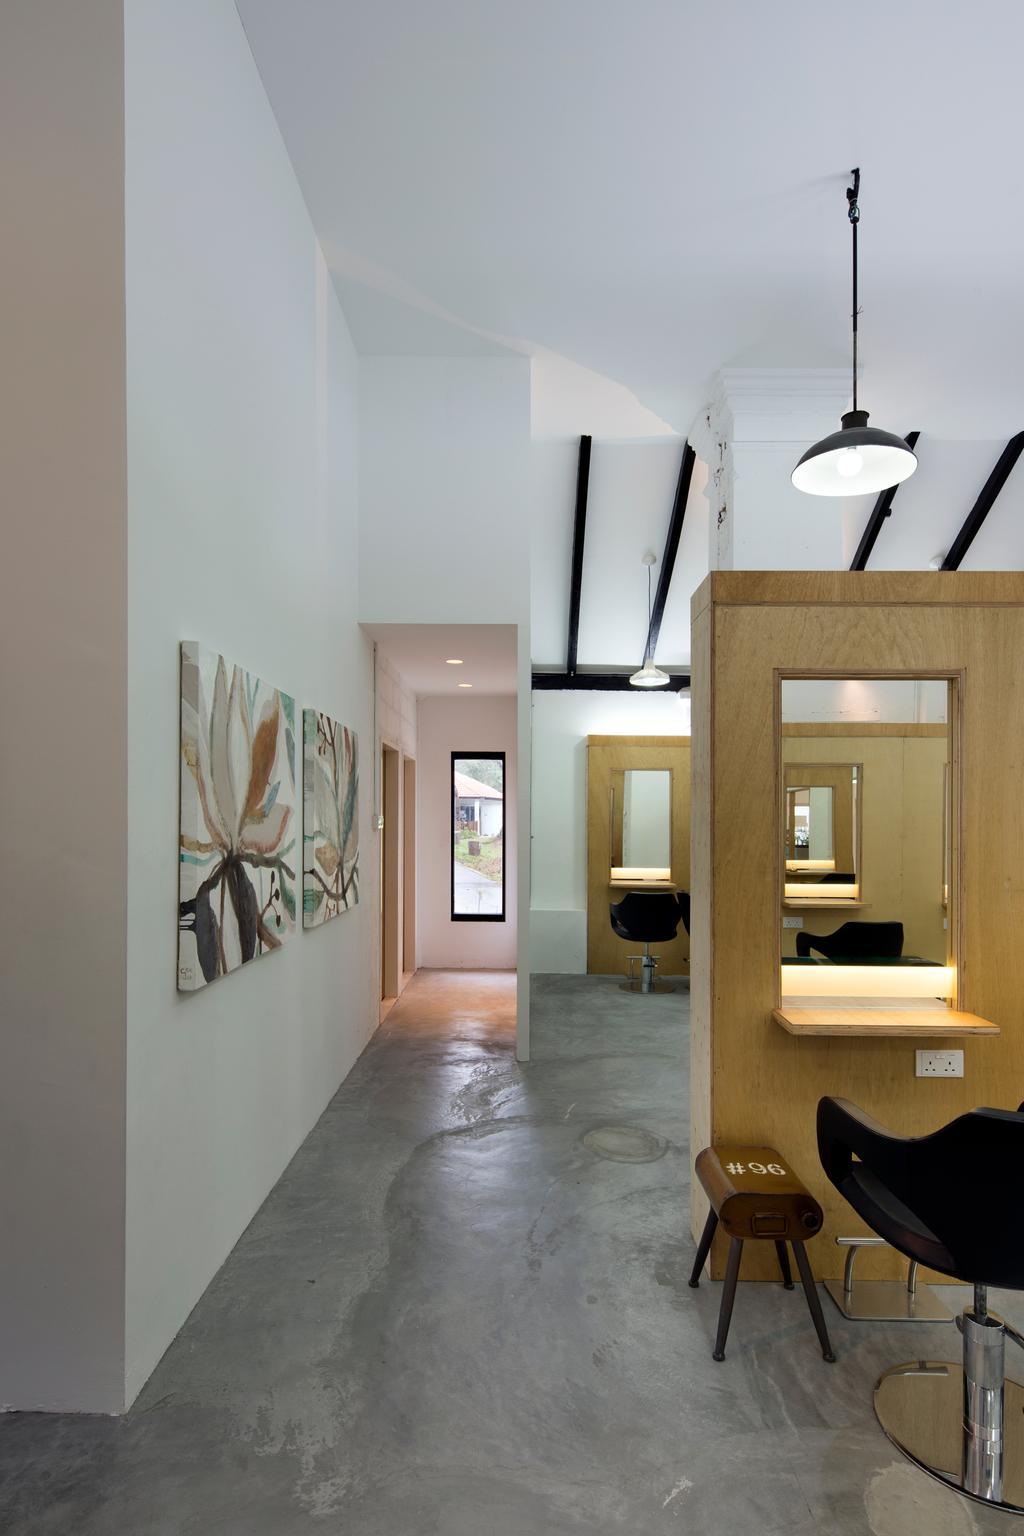 Loewen road, Commercial, Interior Designer, Design by Fifteen Pte Ltd, Contemporary, Indoors, Interior Design, Light Fixture